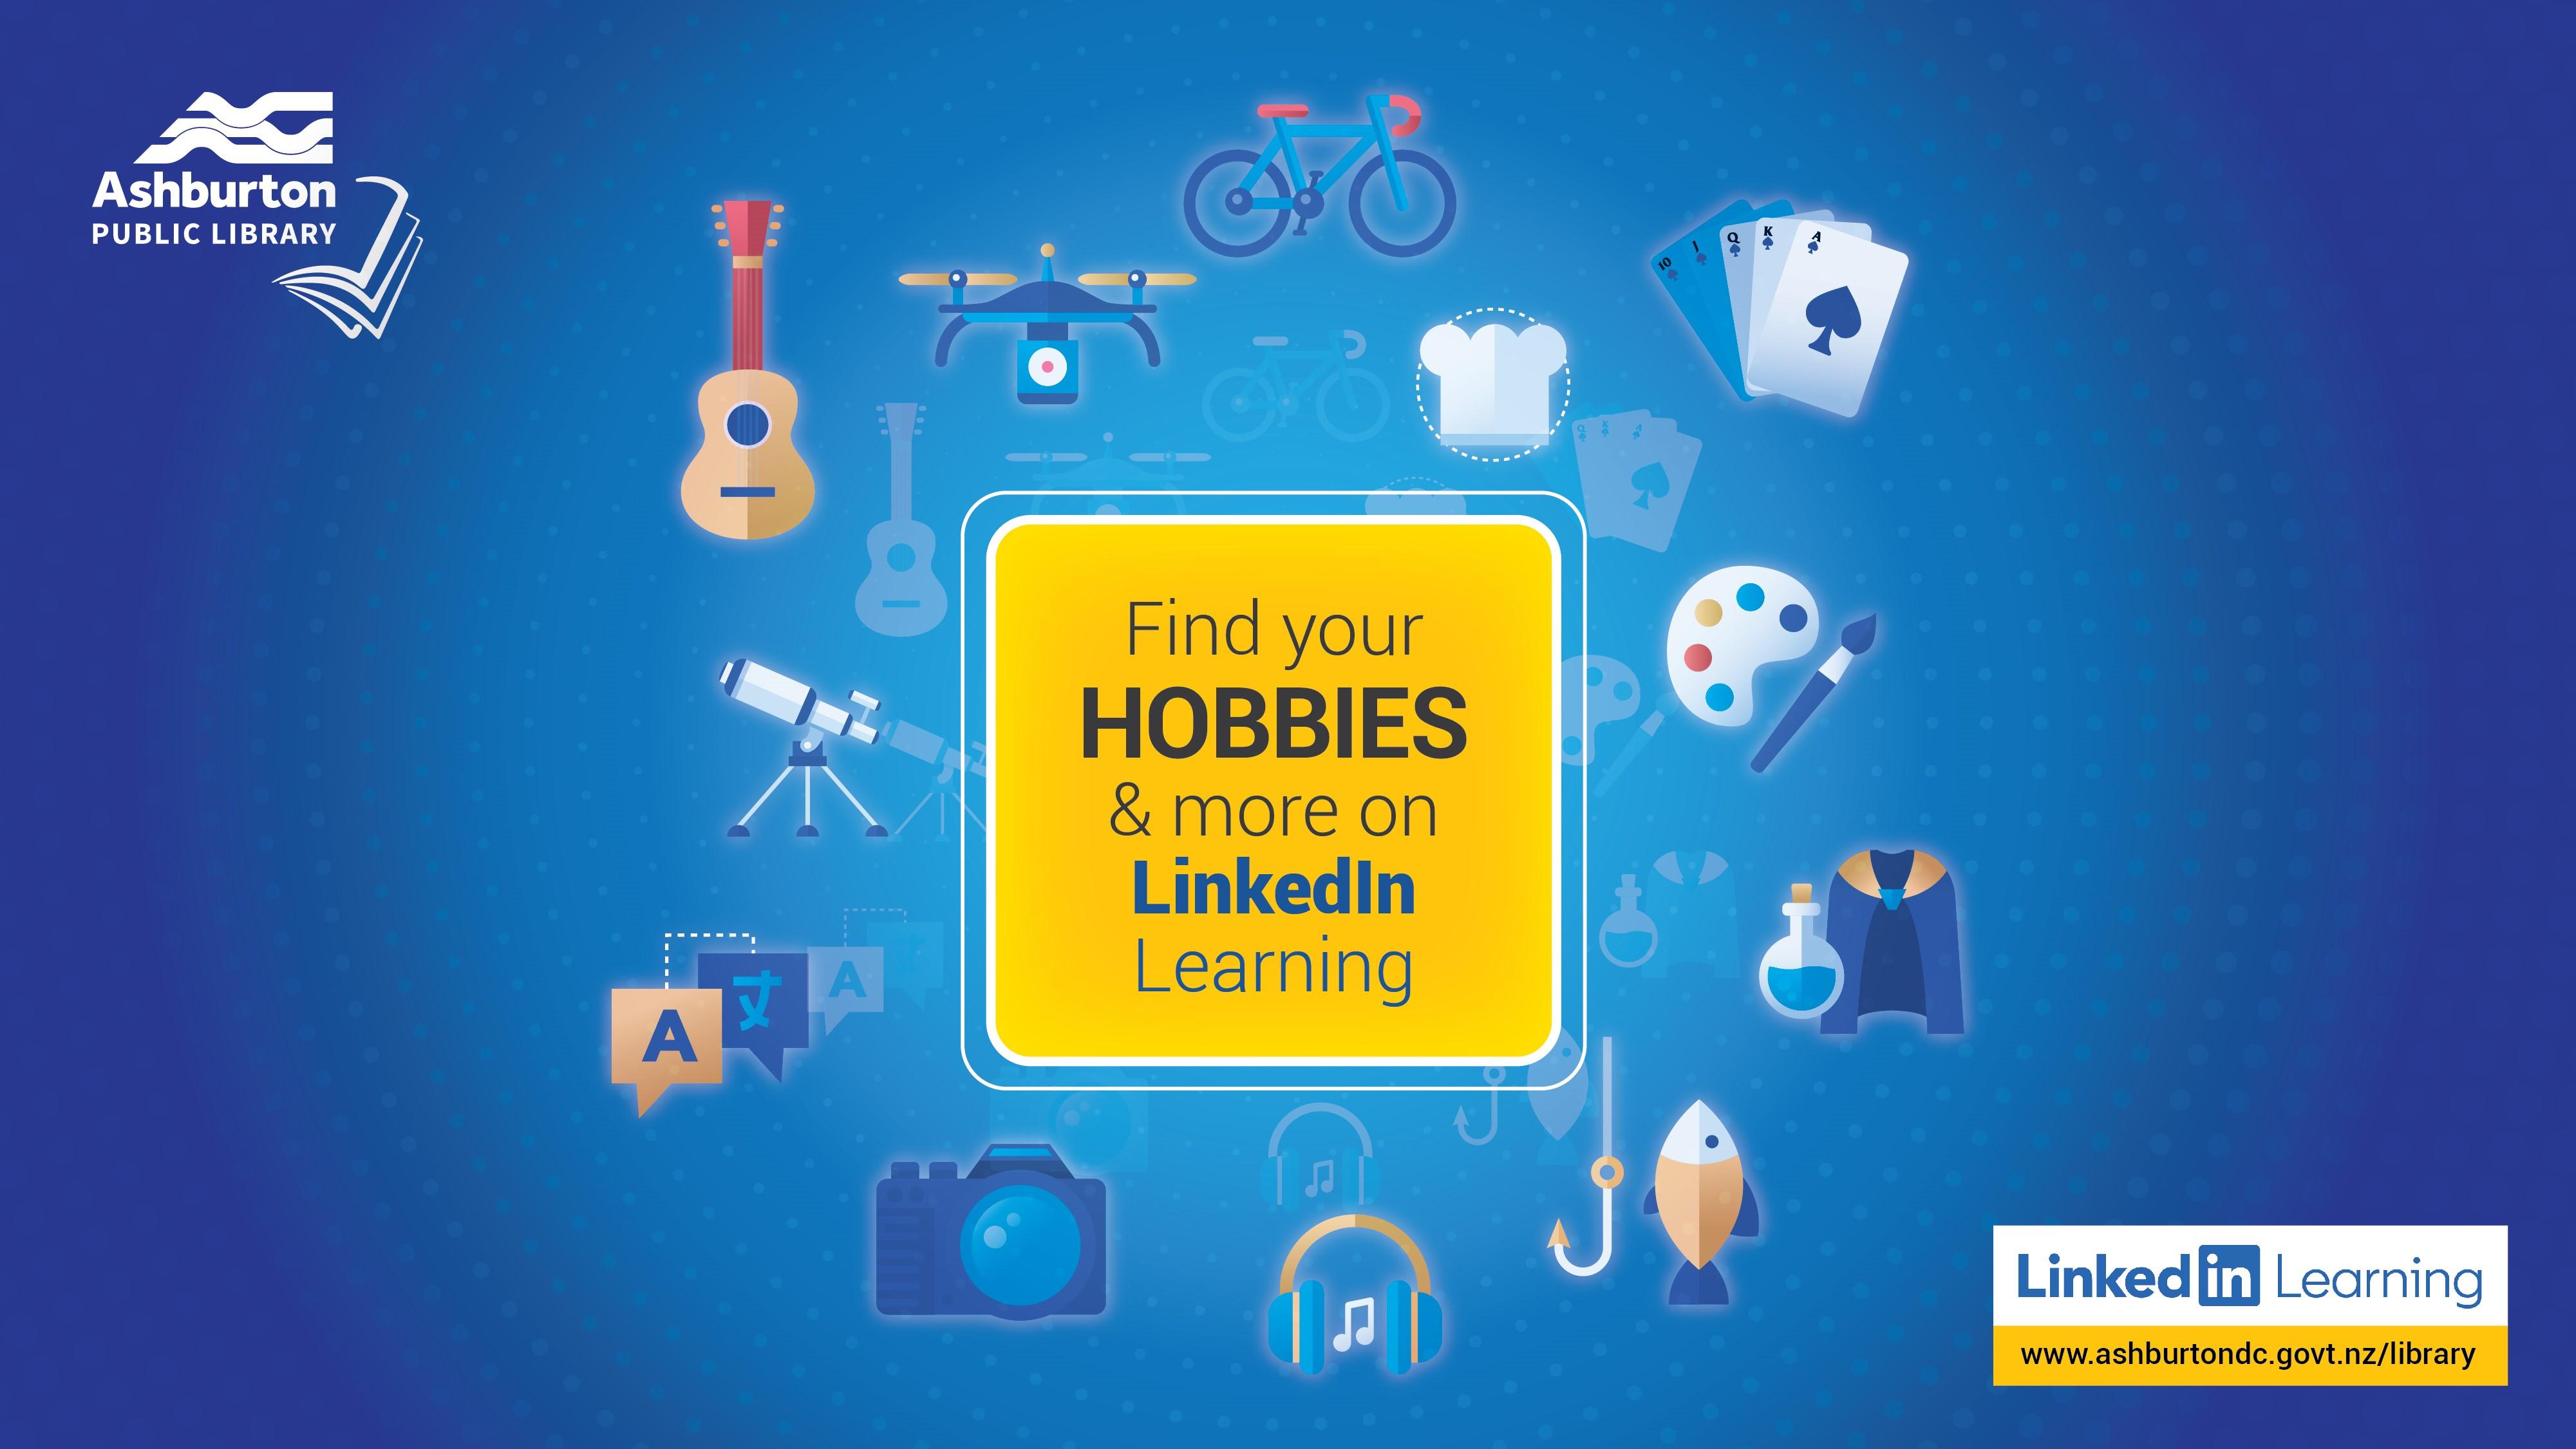 Linkedin Learning Hobbies